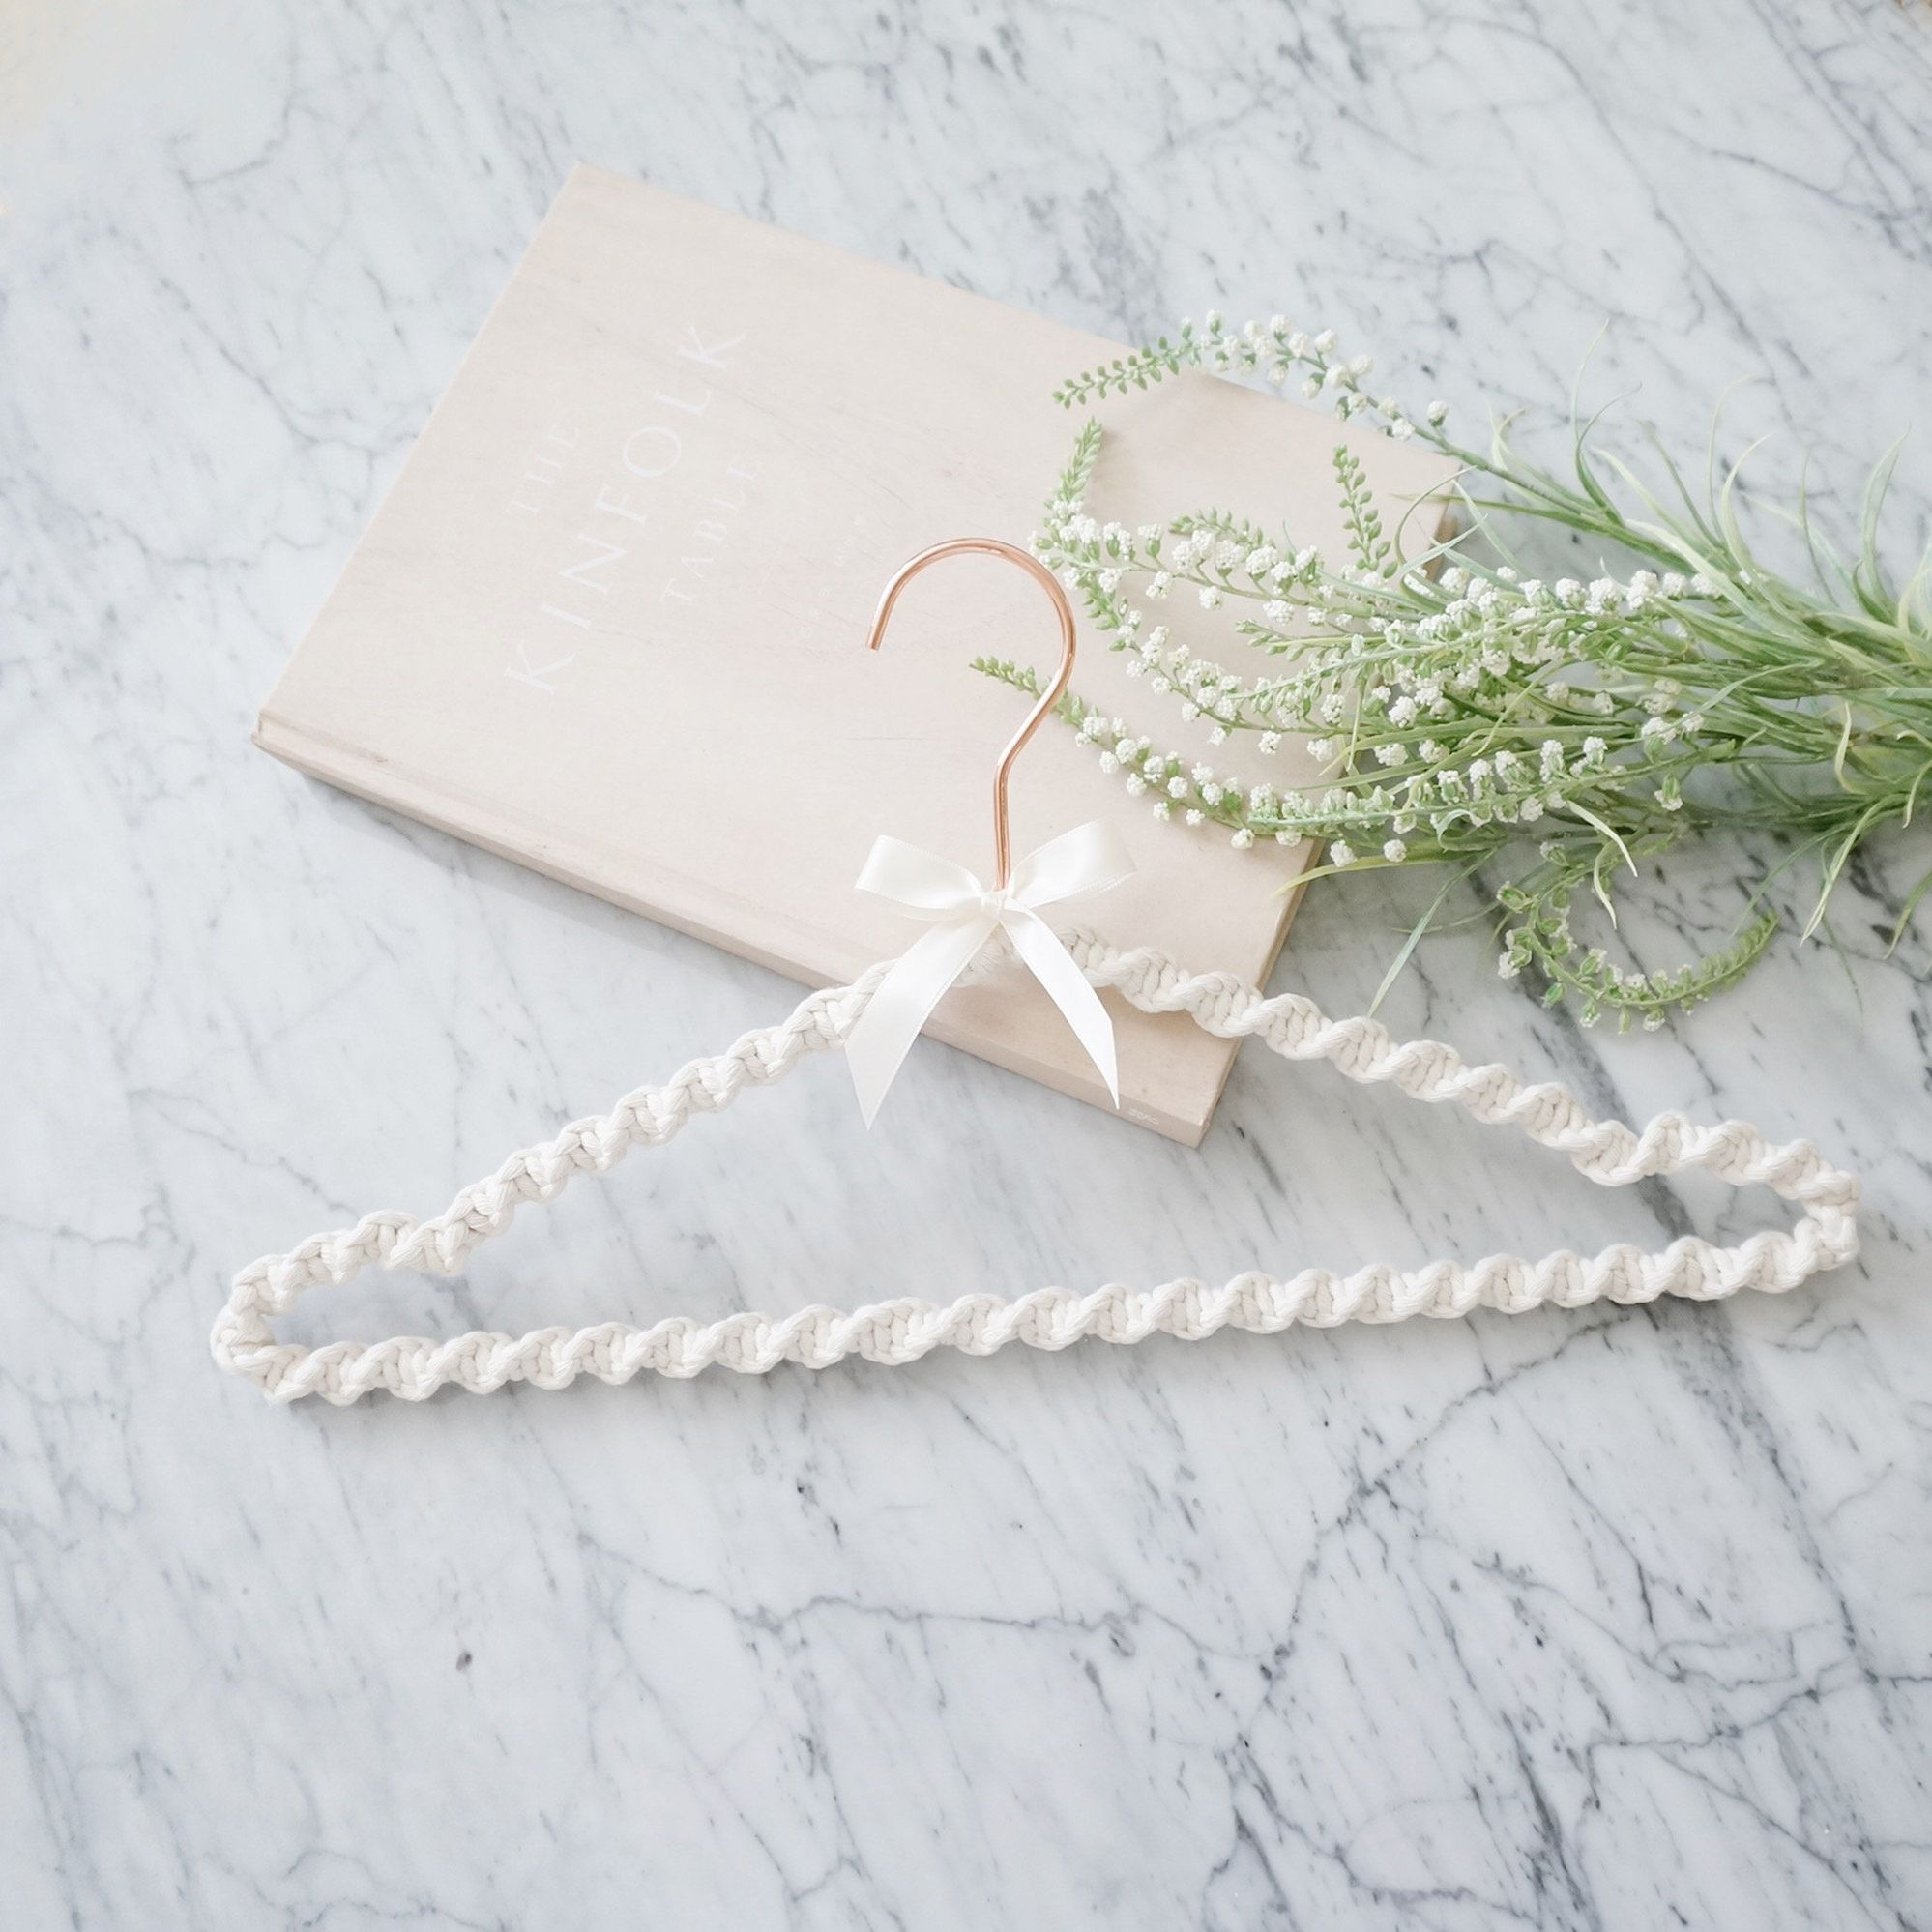 Bridesmaid Hangers for dresses Wedding Party Bridal Hangers Personalized Black Hangers Bride Hanger